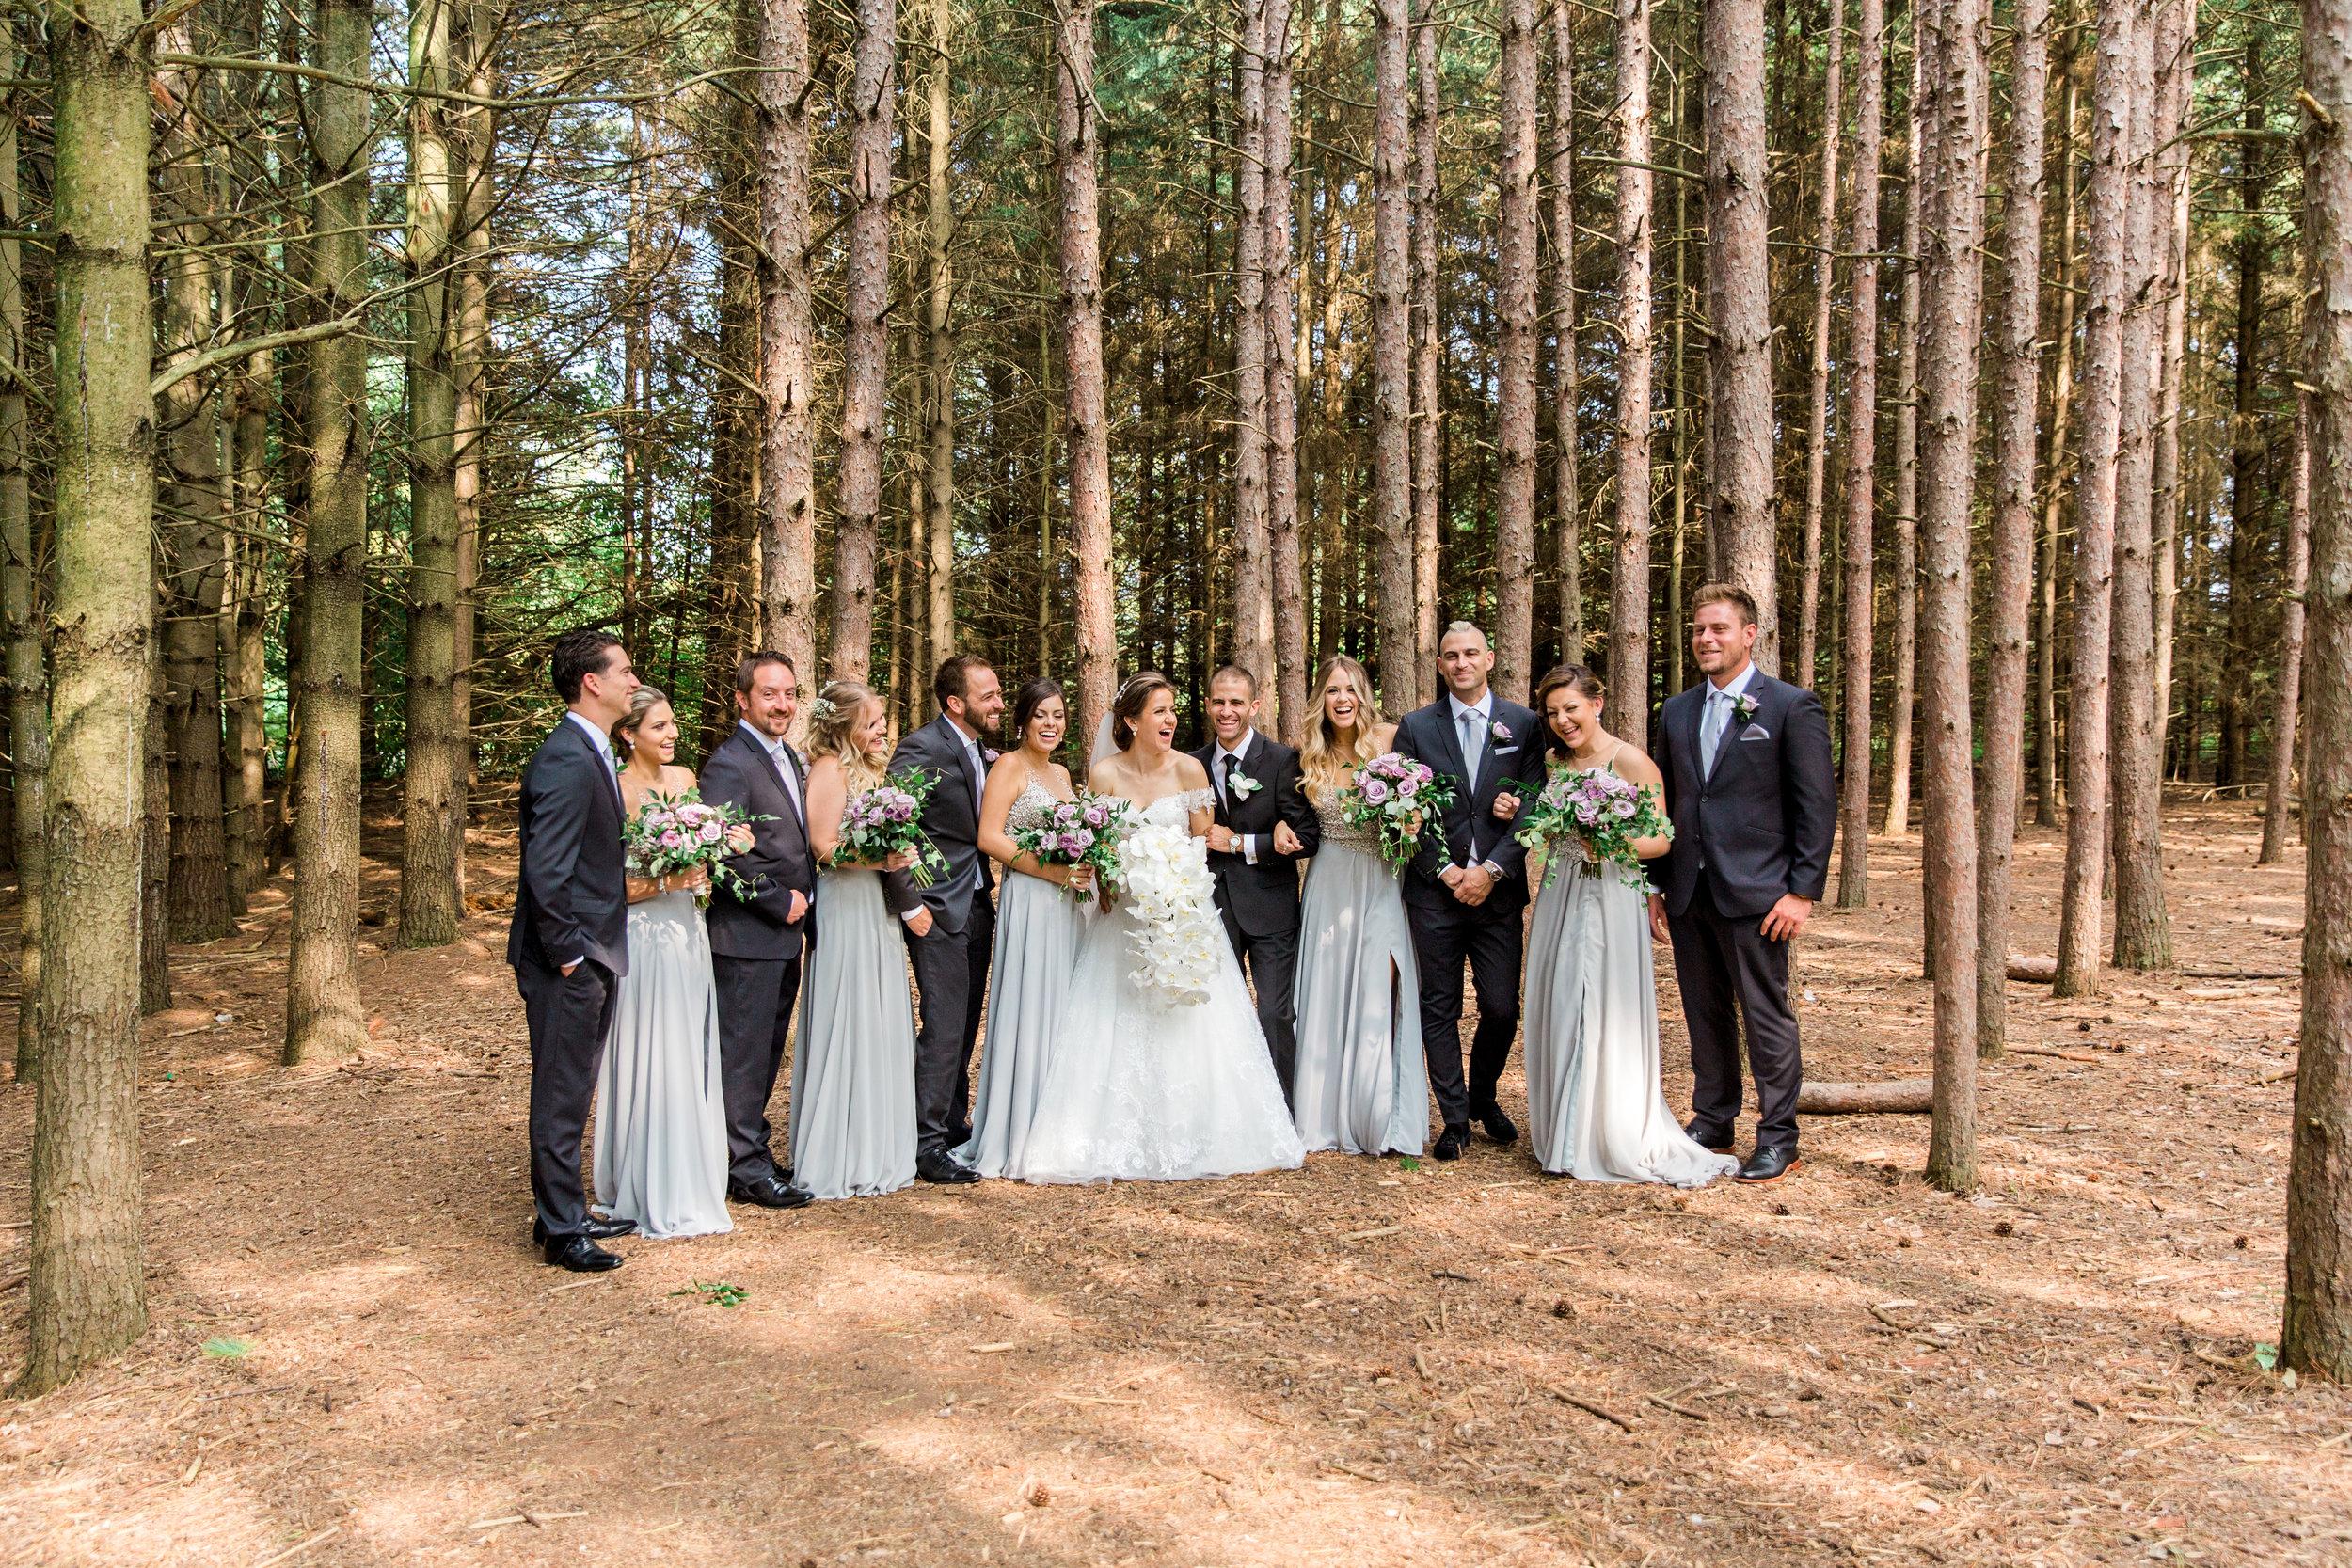 Danielle-Giroux-Amir-Golbazi-Toronto-Wedding-Photographer-Bellvue-Manor_DeLuca_1-553.jpg